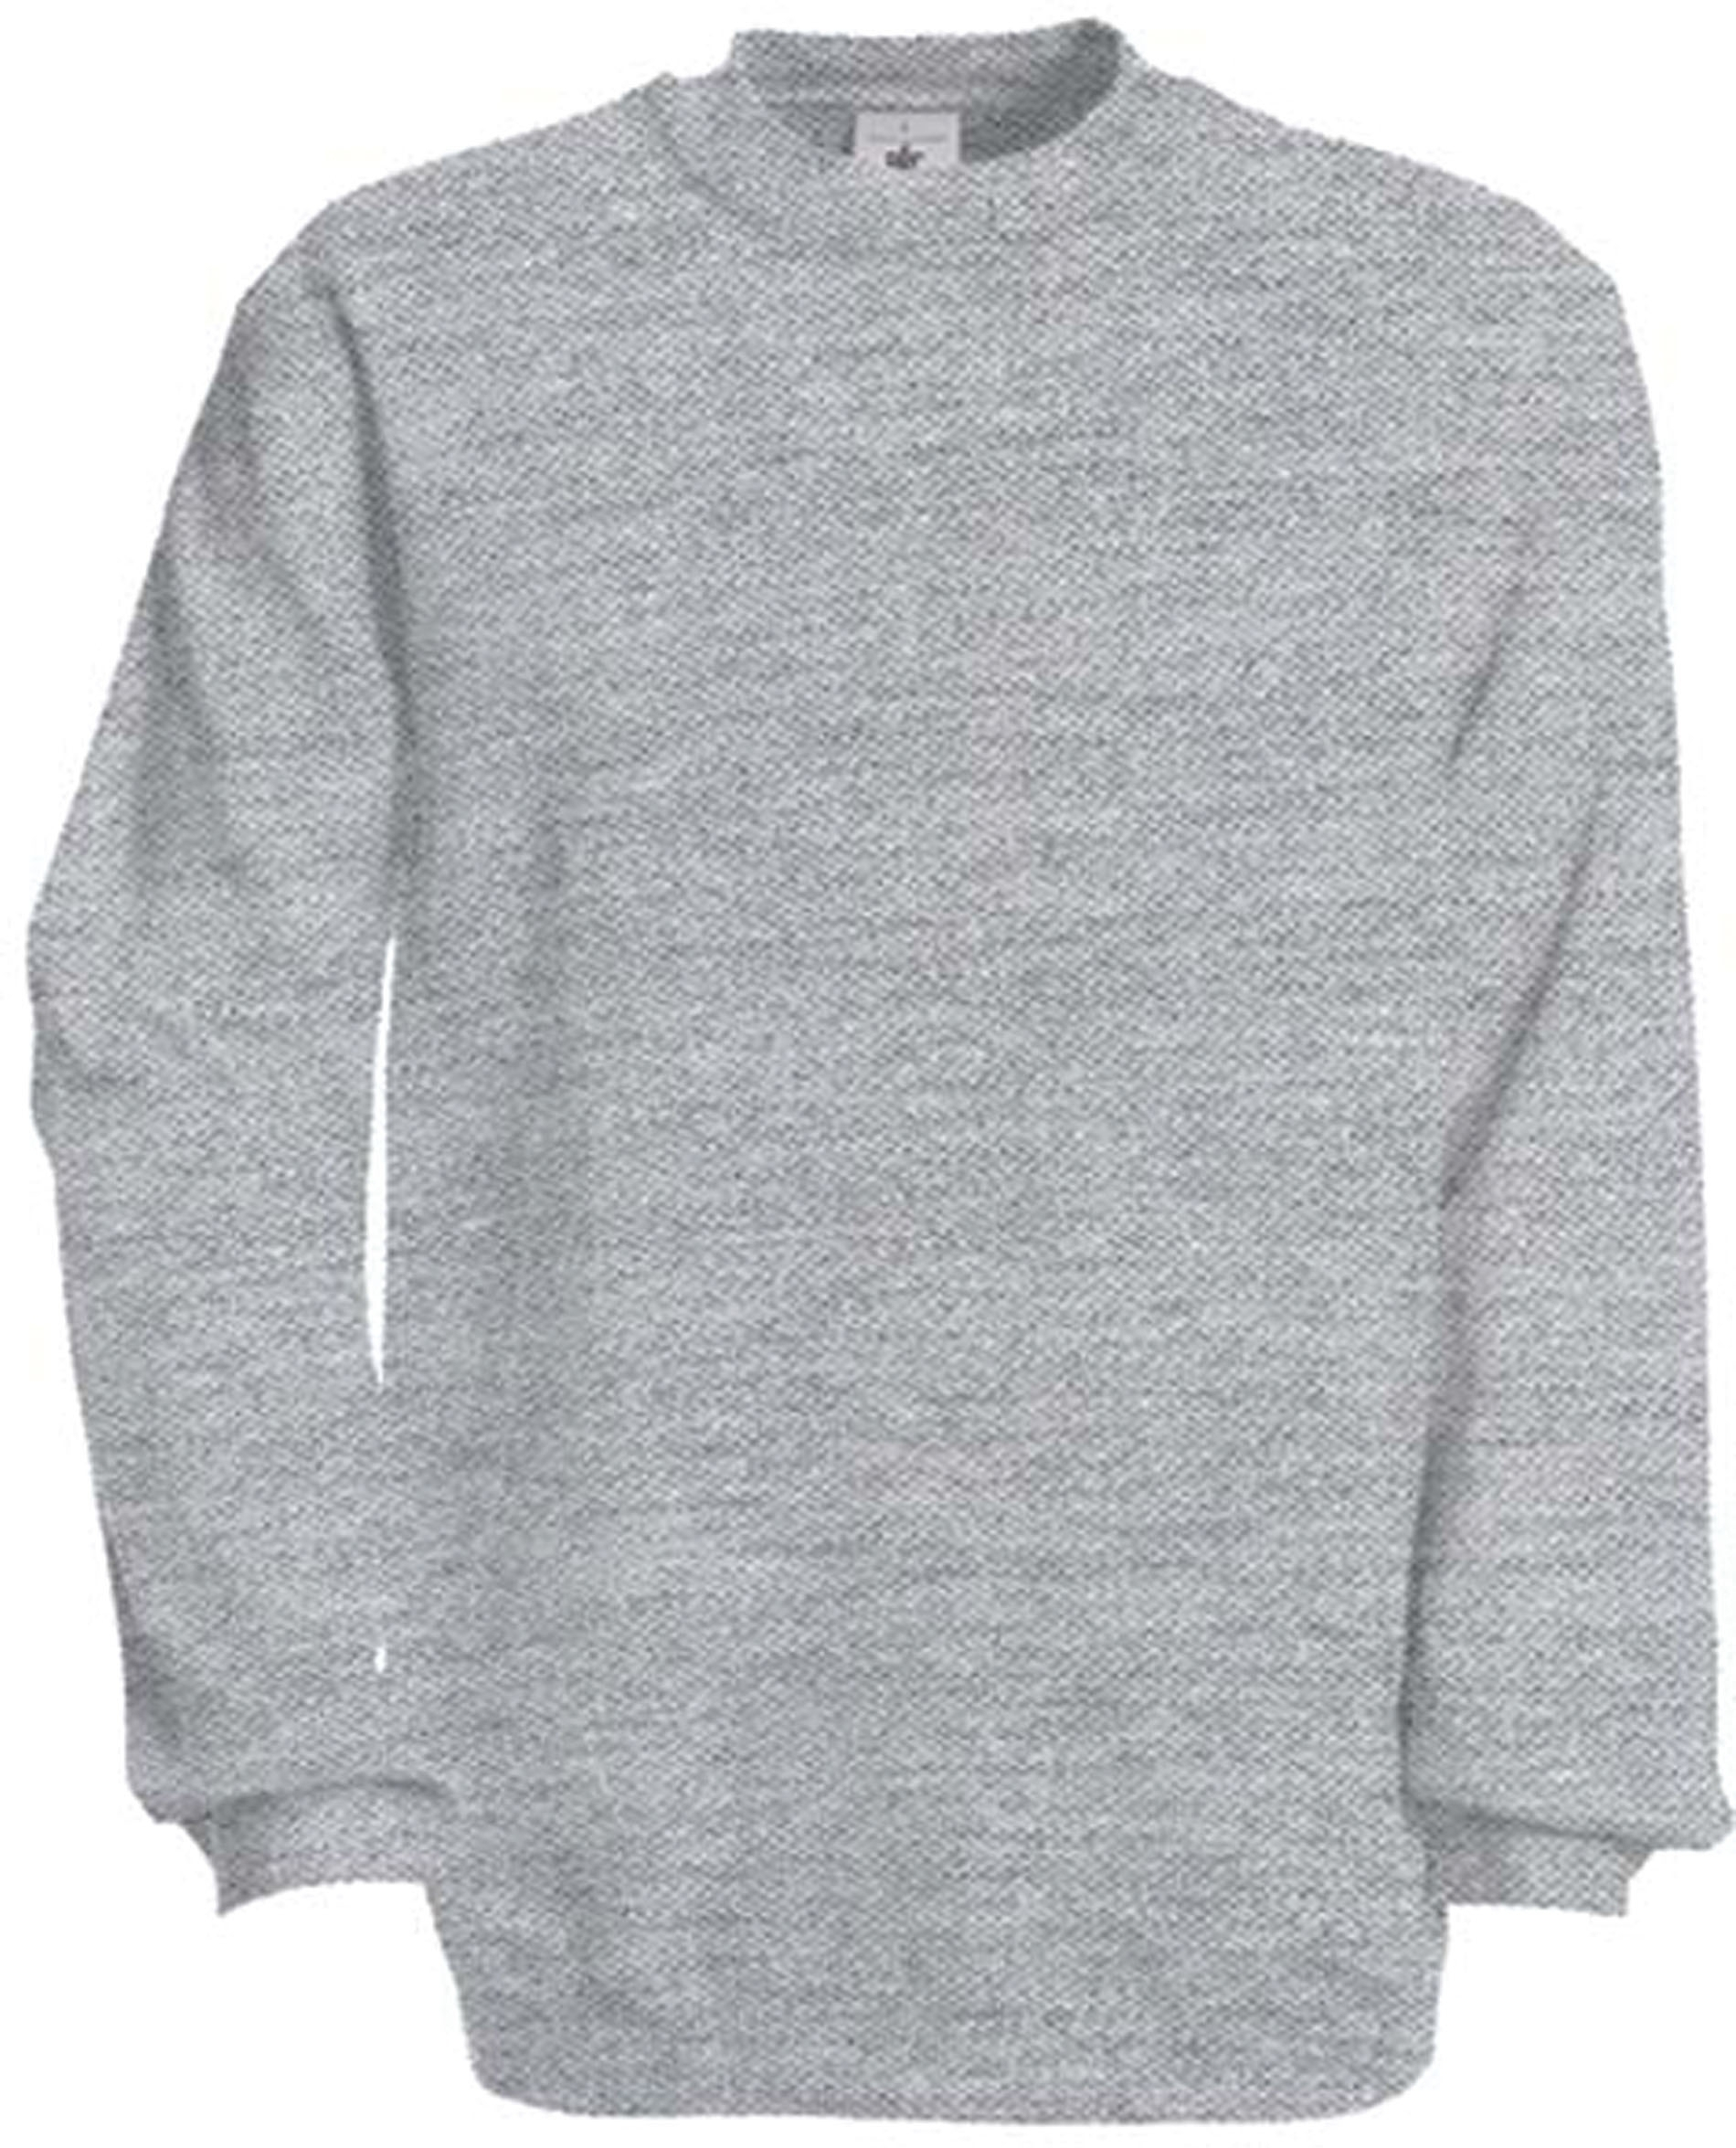 sweat shirt manches col rond heather grey gladiasport. Black Bedroom Furniture Sets. Home Design Ideas